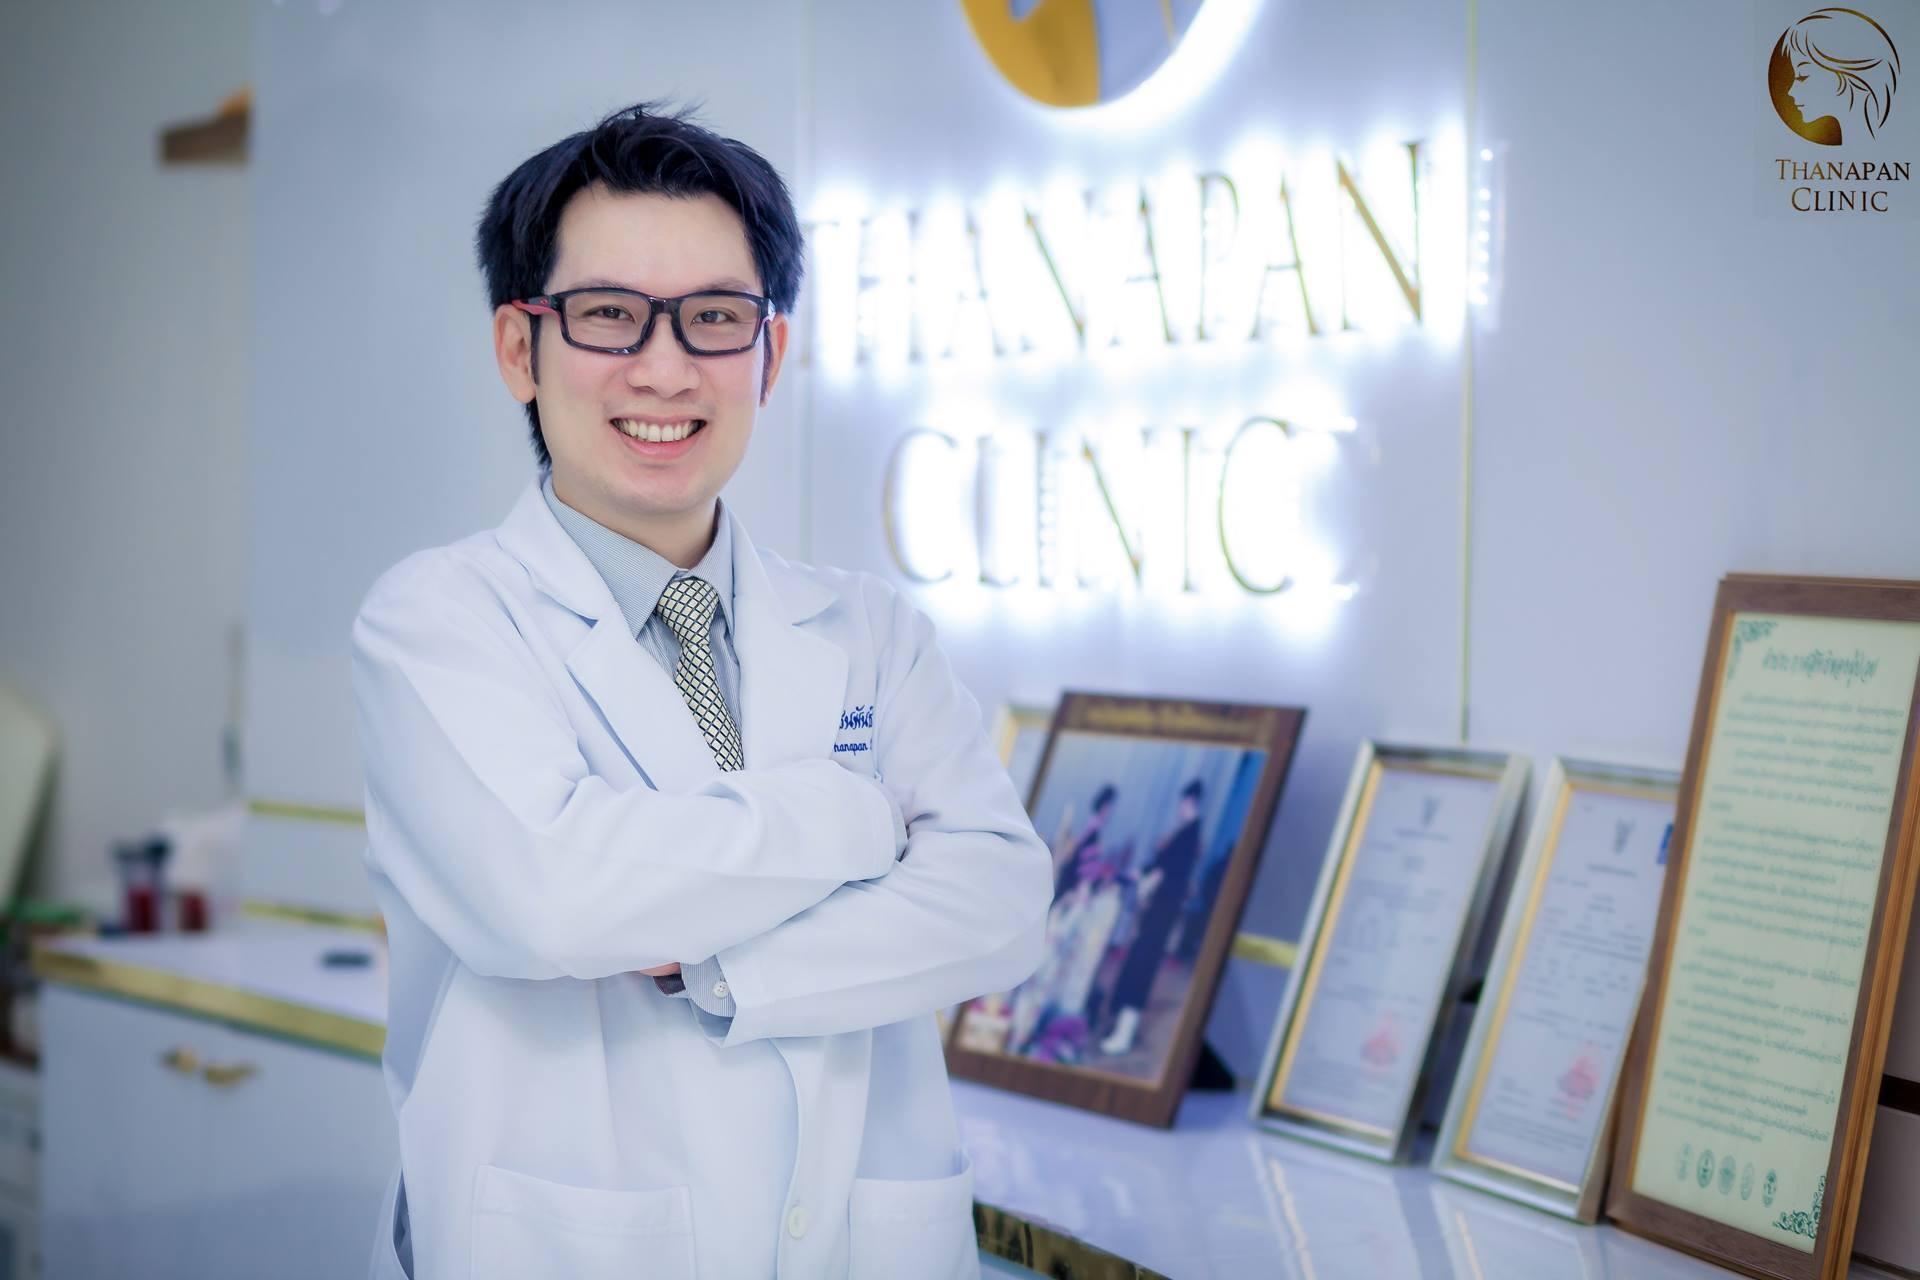 https://www.facebook.com/ThanapanClinicbyDr.Thanapan/